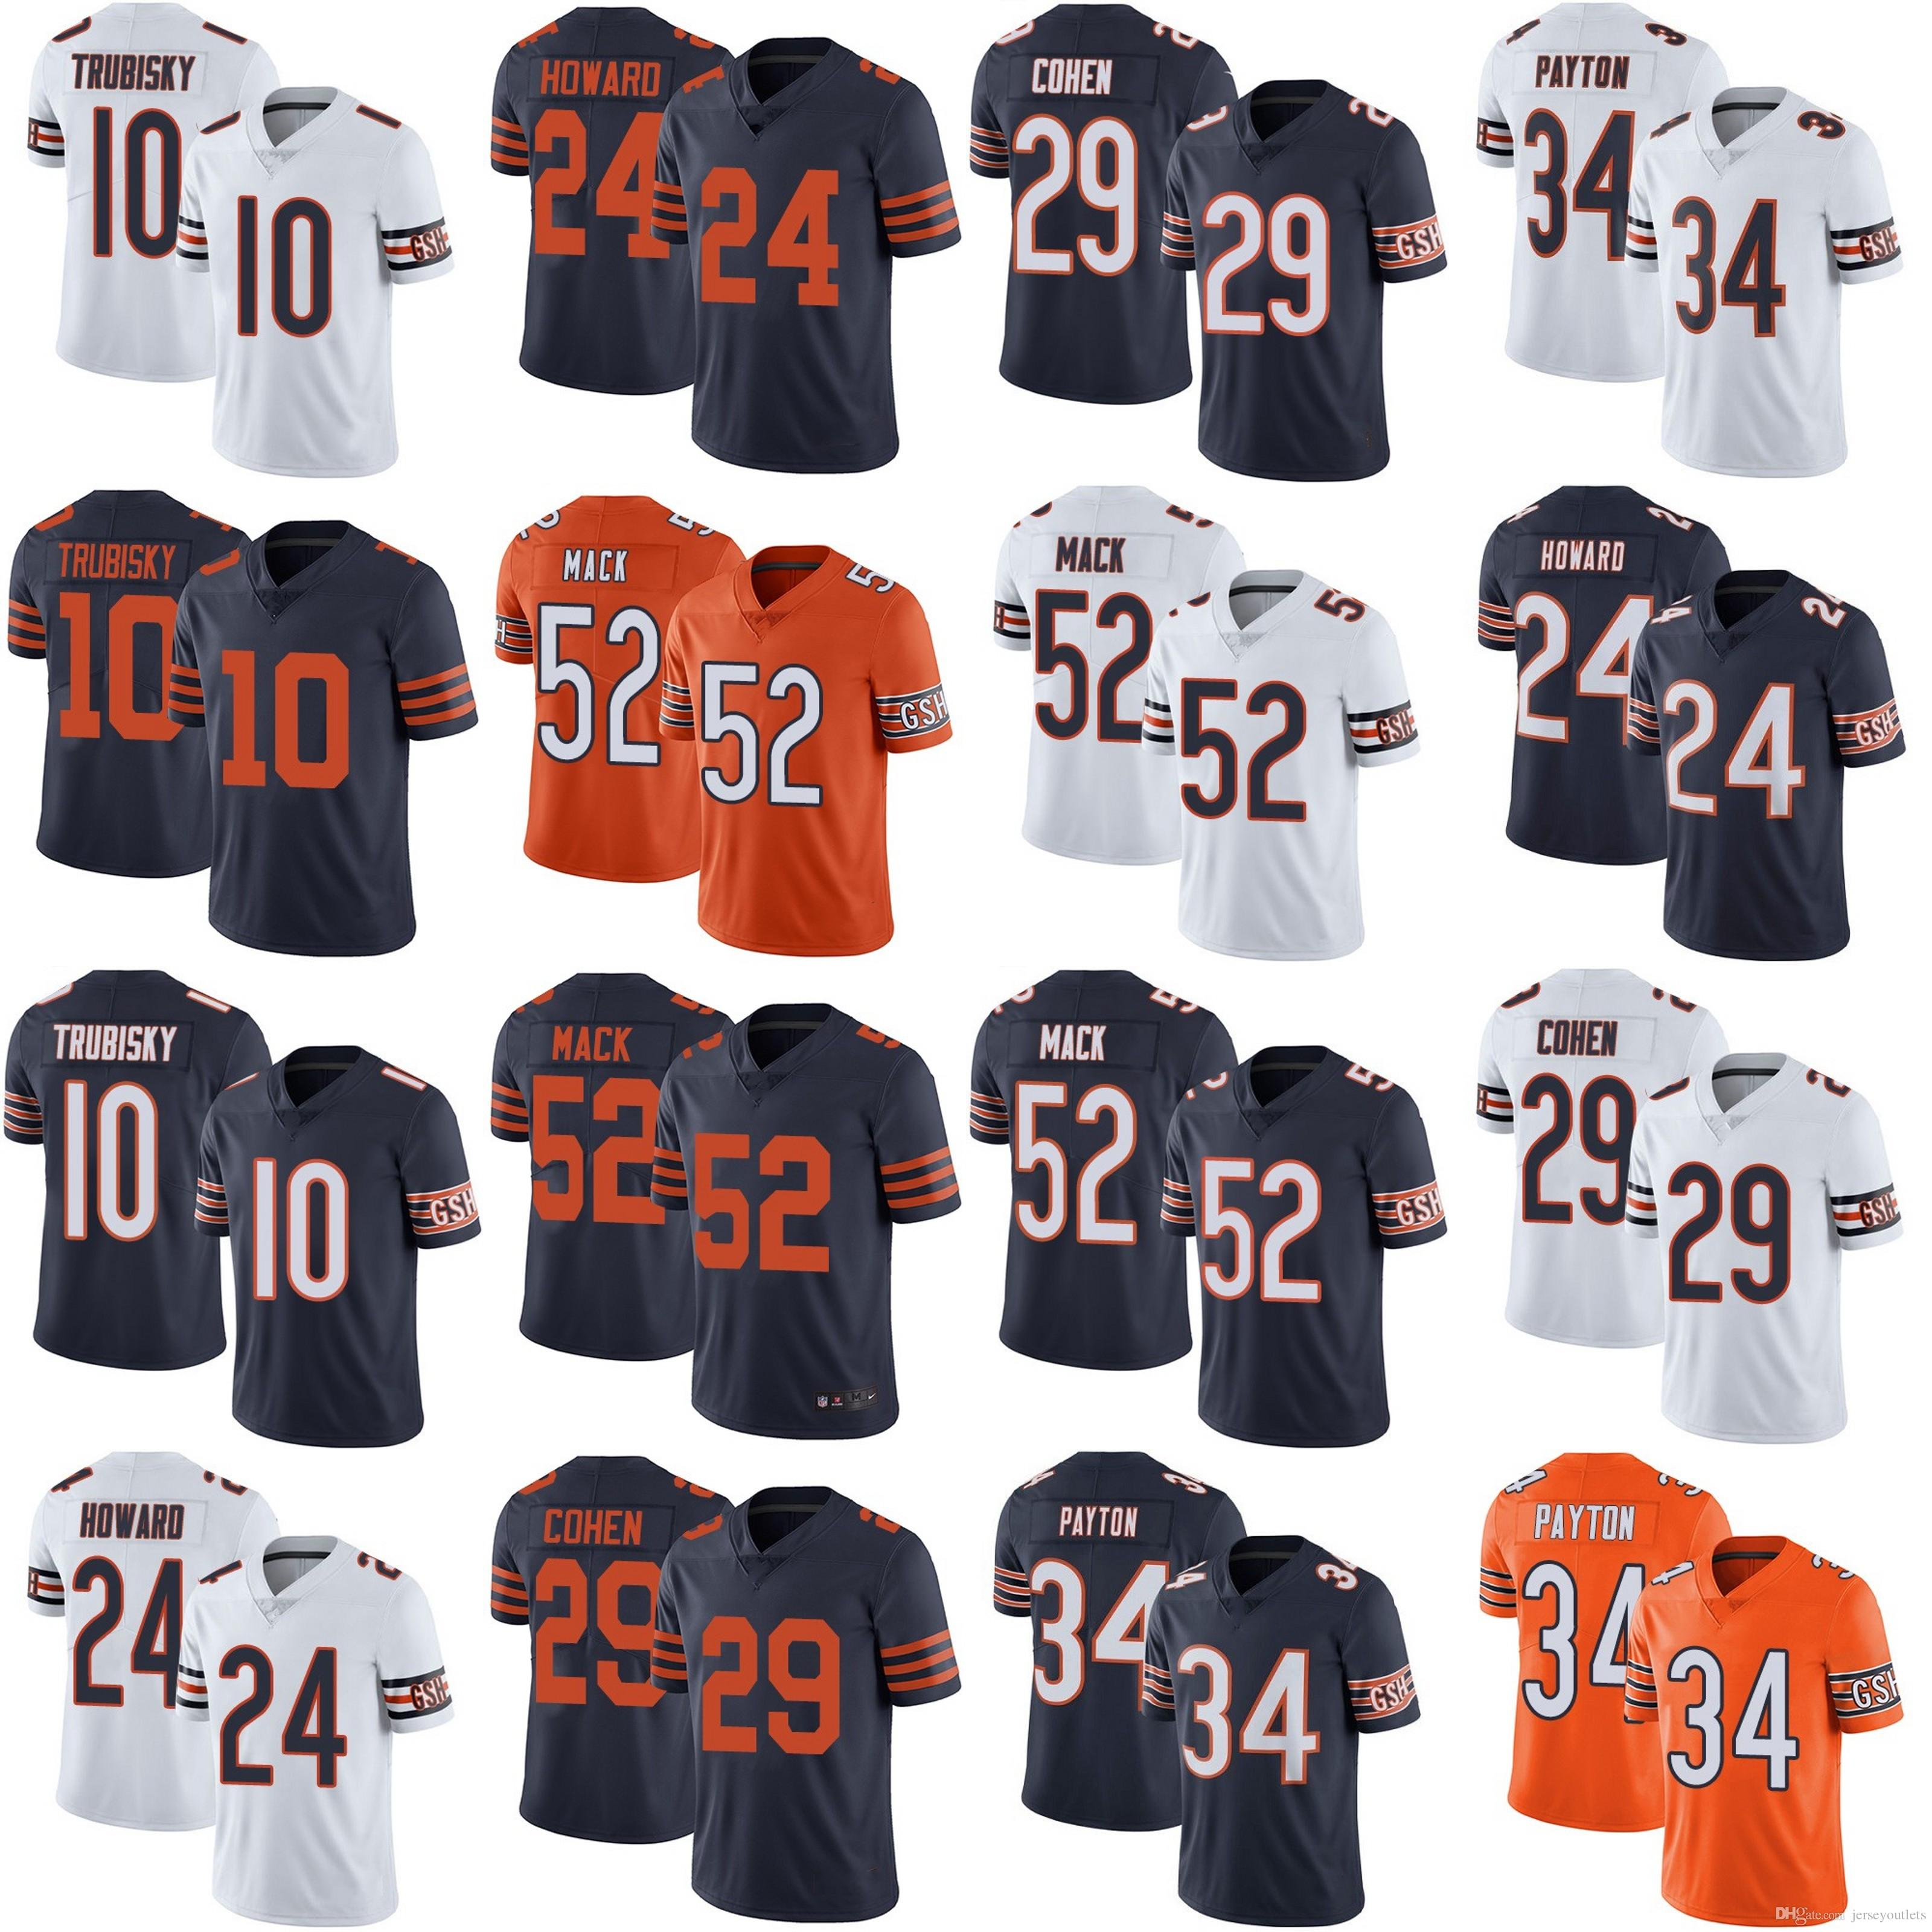 Cheap Black Football Jersey White Numbers Best Brady Michigan Jersey 240c22642